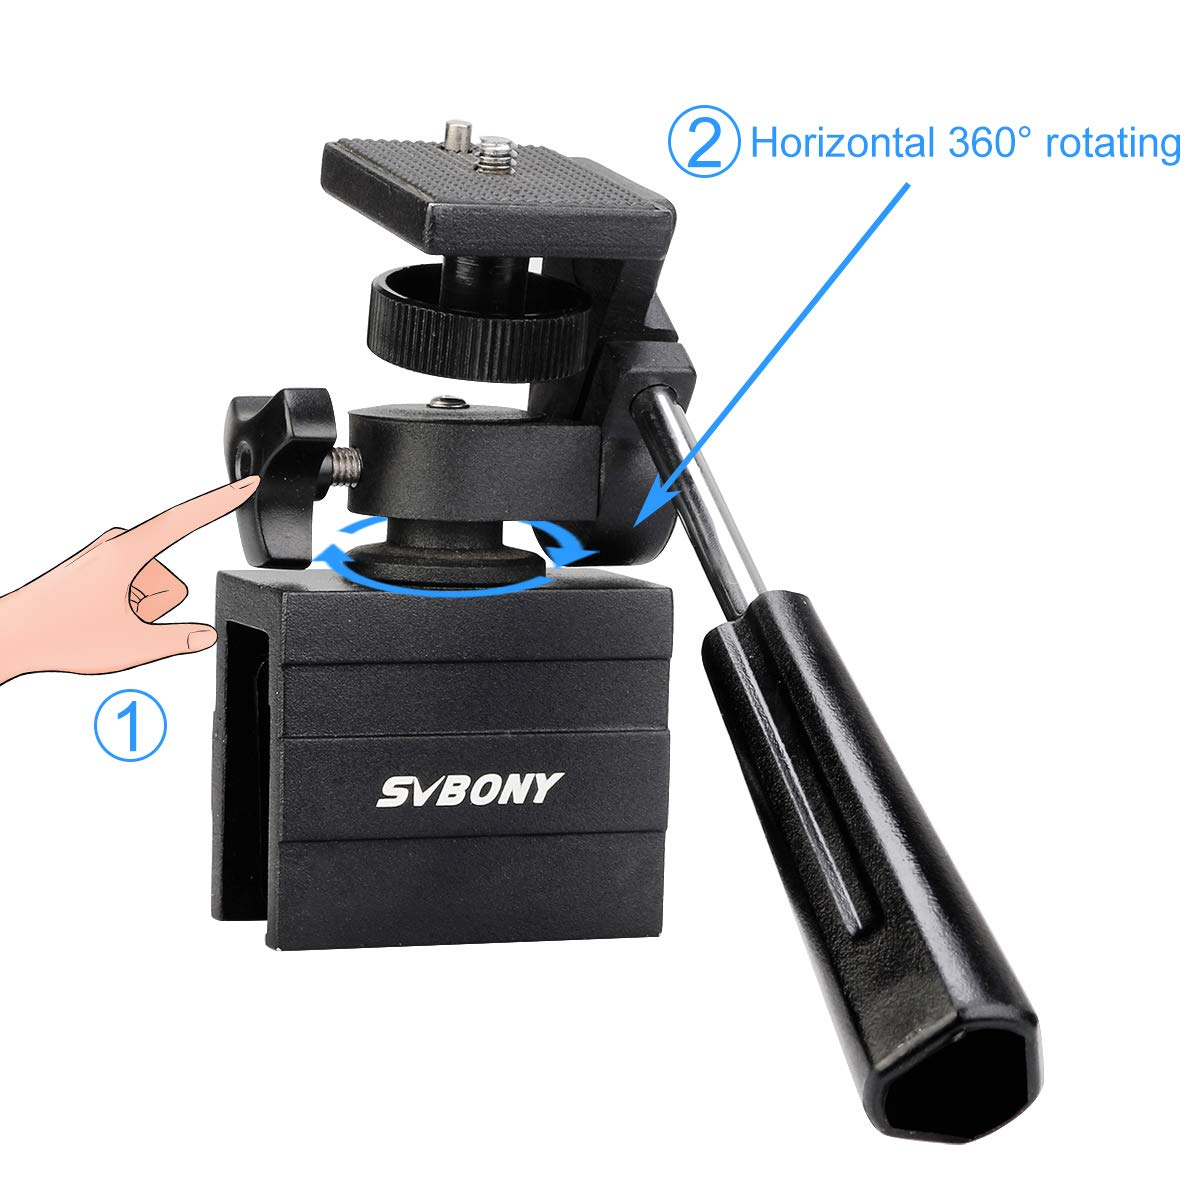 SVBONY SV126 Window Mount Adjustable Vehicle Car Clamp Mount Compact for Spotting Scope Monocular Binocular Telescope SLR Camera with Mounting Thread